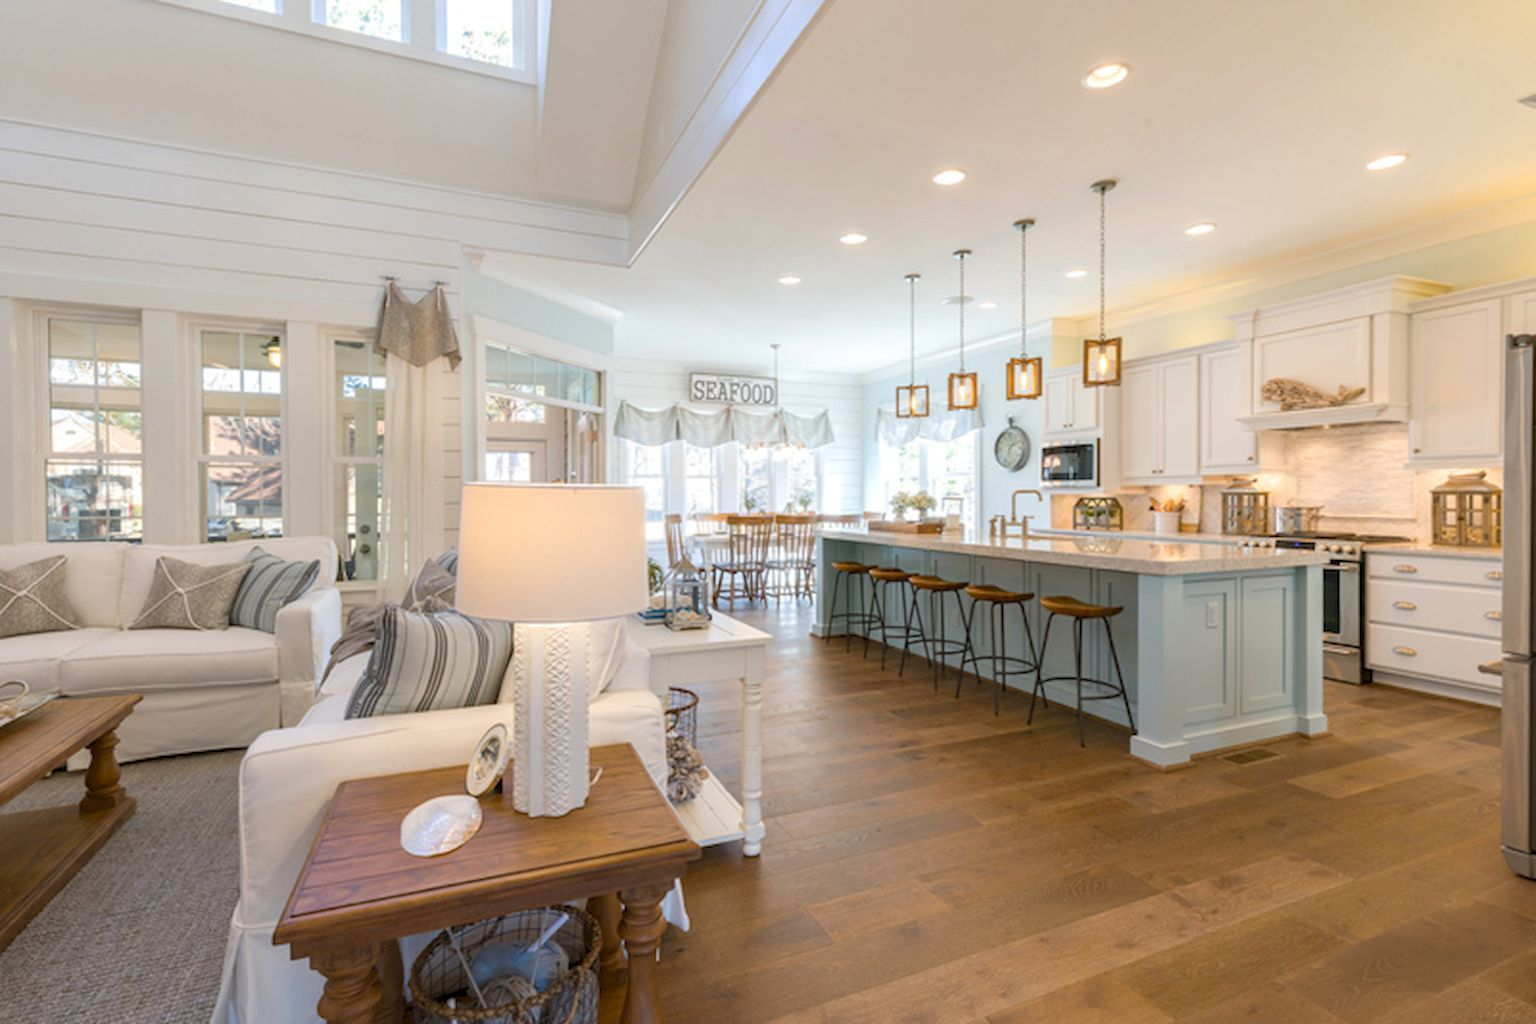 Adorable 65 Comfy Coastal Living Room Decorating Ideas Https Homearchite